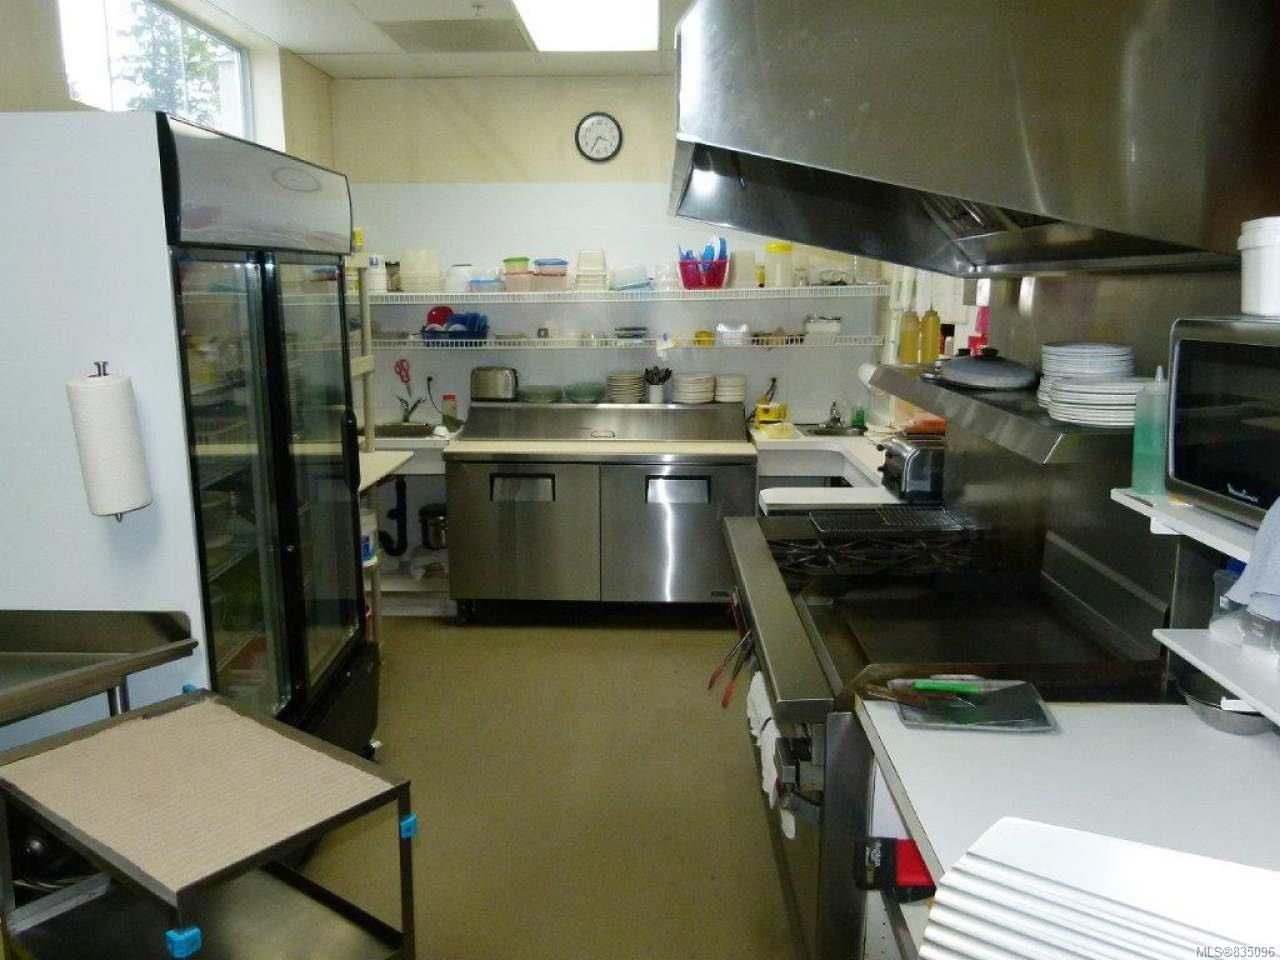 Photo 26: Photos: 2025 Bowen Rd in NANAIMO: Na Central Nanaimo Mixed Use for sale (Nanaimo)  : MLS®# 835096